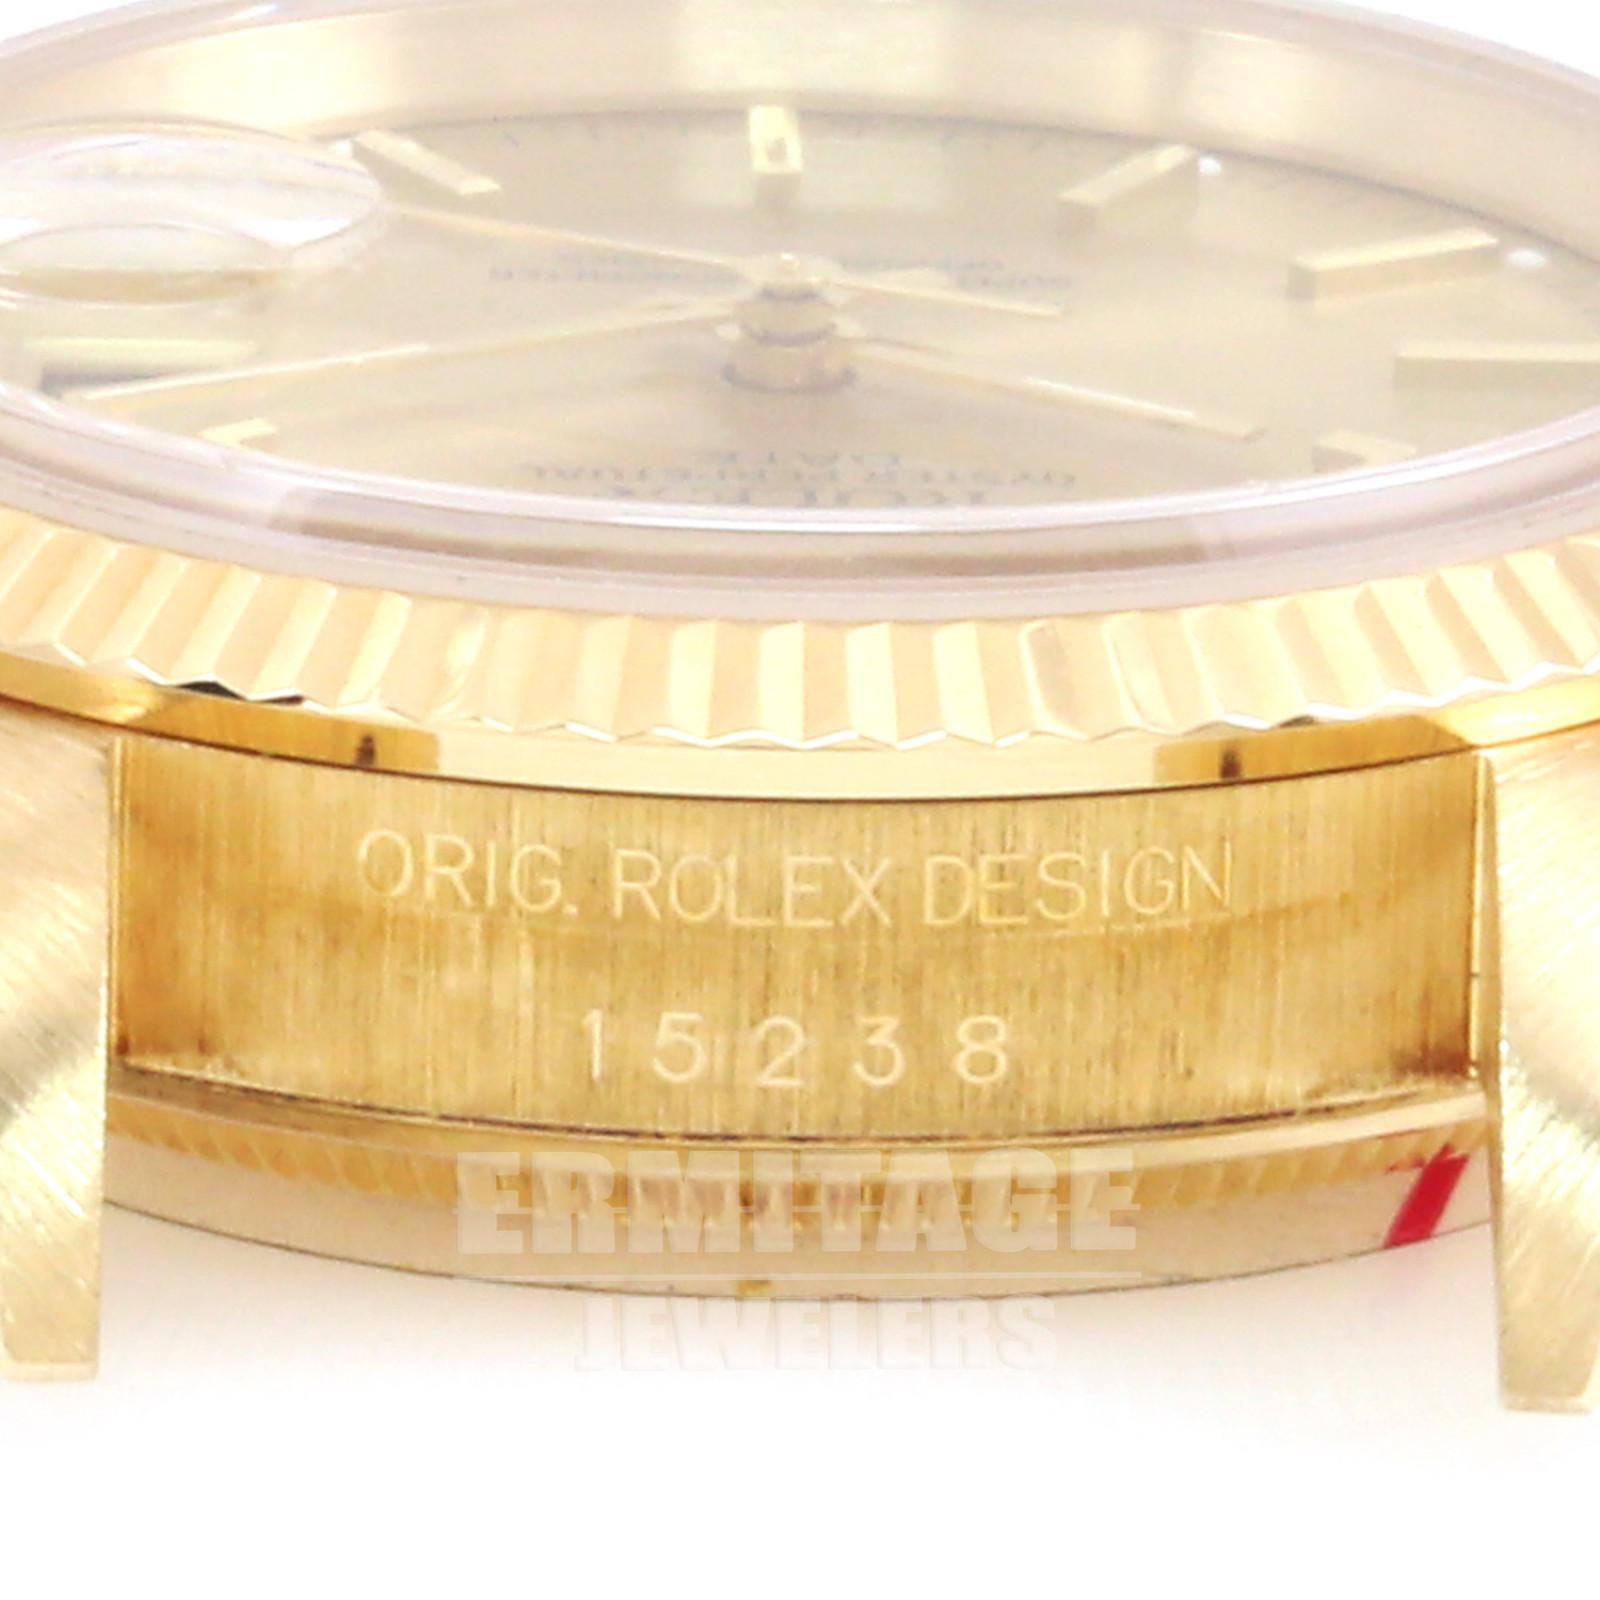 Pre-Owned Rolex Date 15238